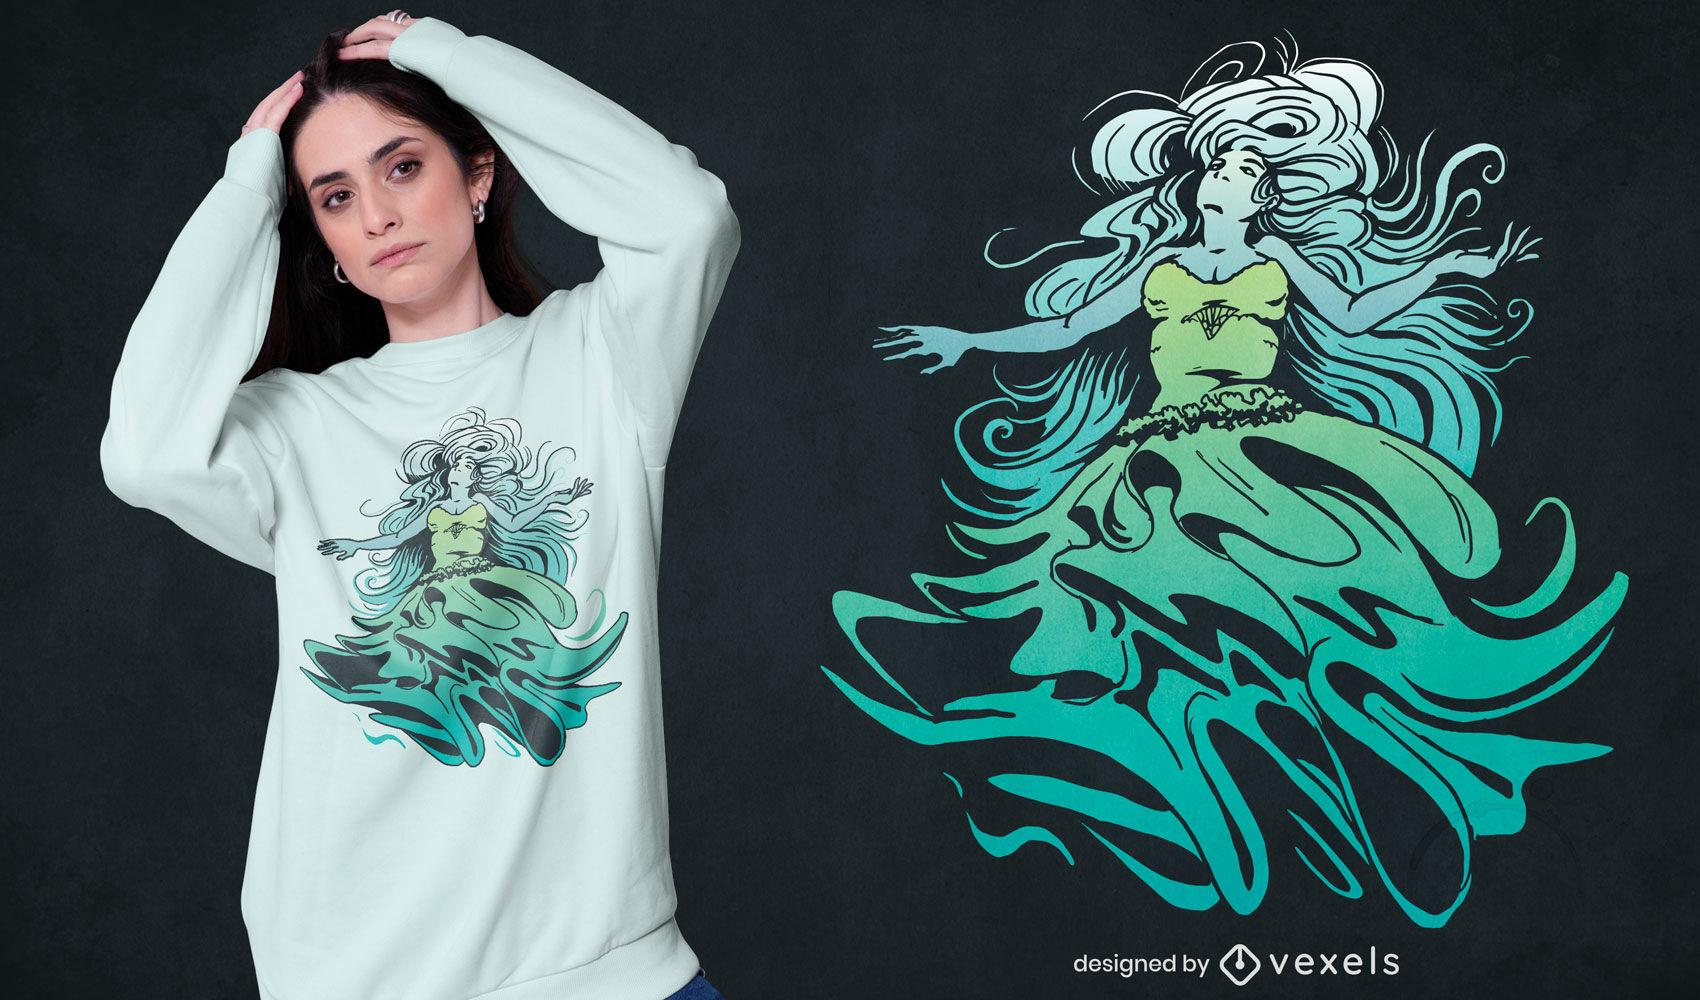 Ghost bride halloween monster t-shirt design